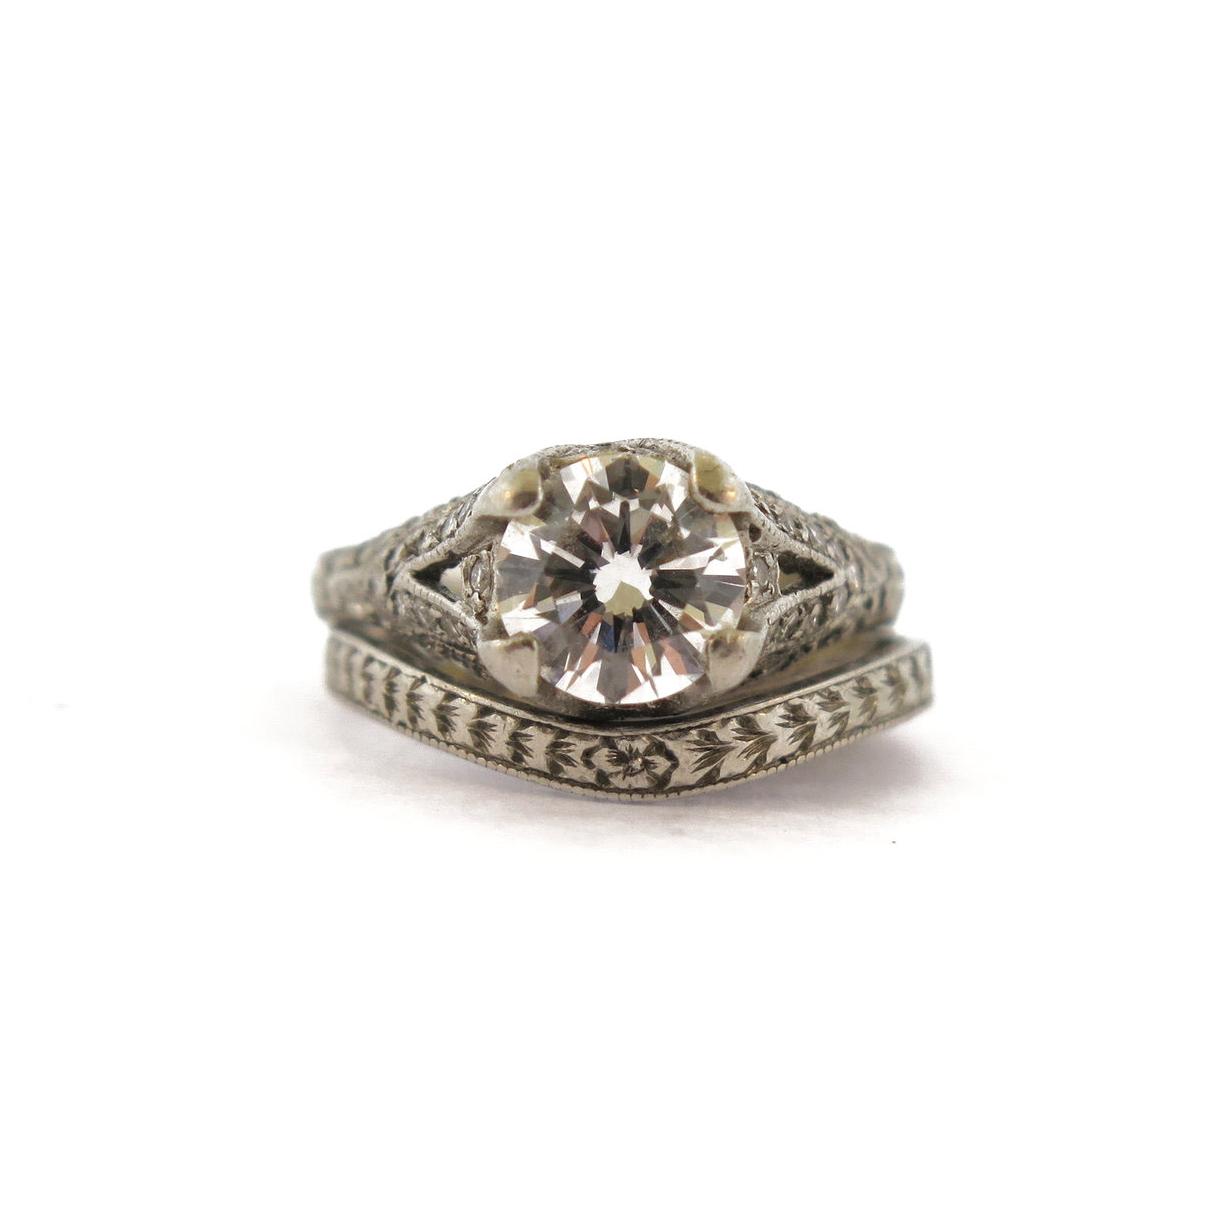 Deco/Edwardian Diamond Platinum Ring Set, Center Diamond 1.05 CT D Color